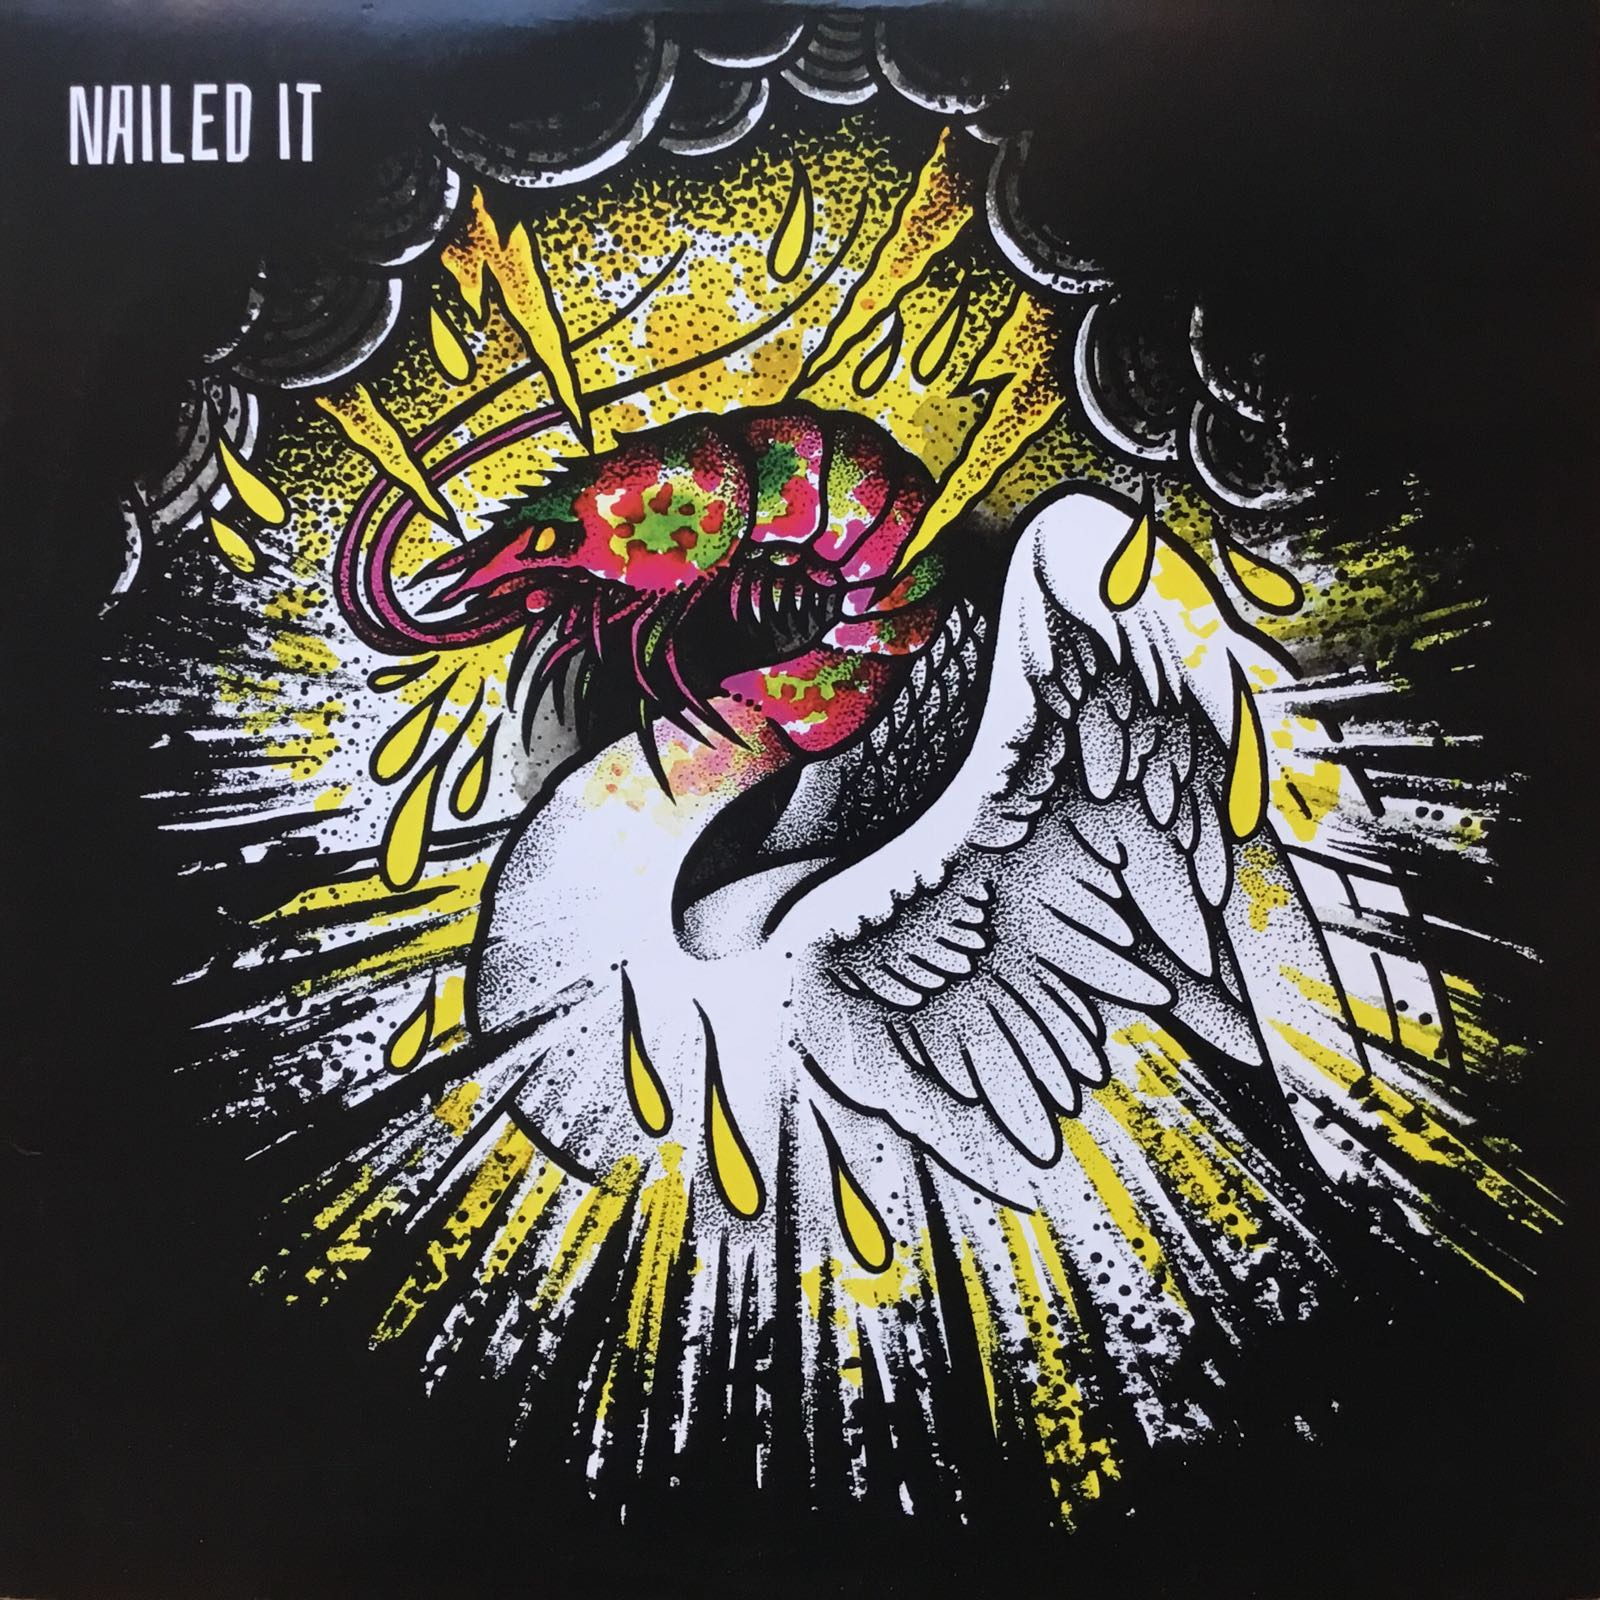 Blåneggel - Nailed It [LP]